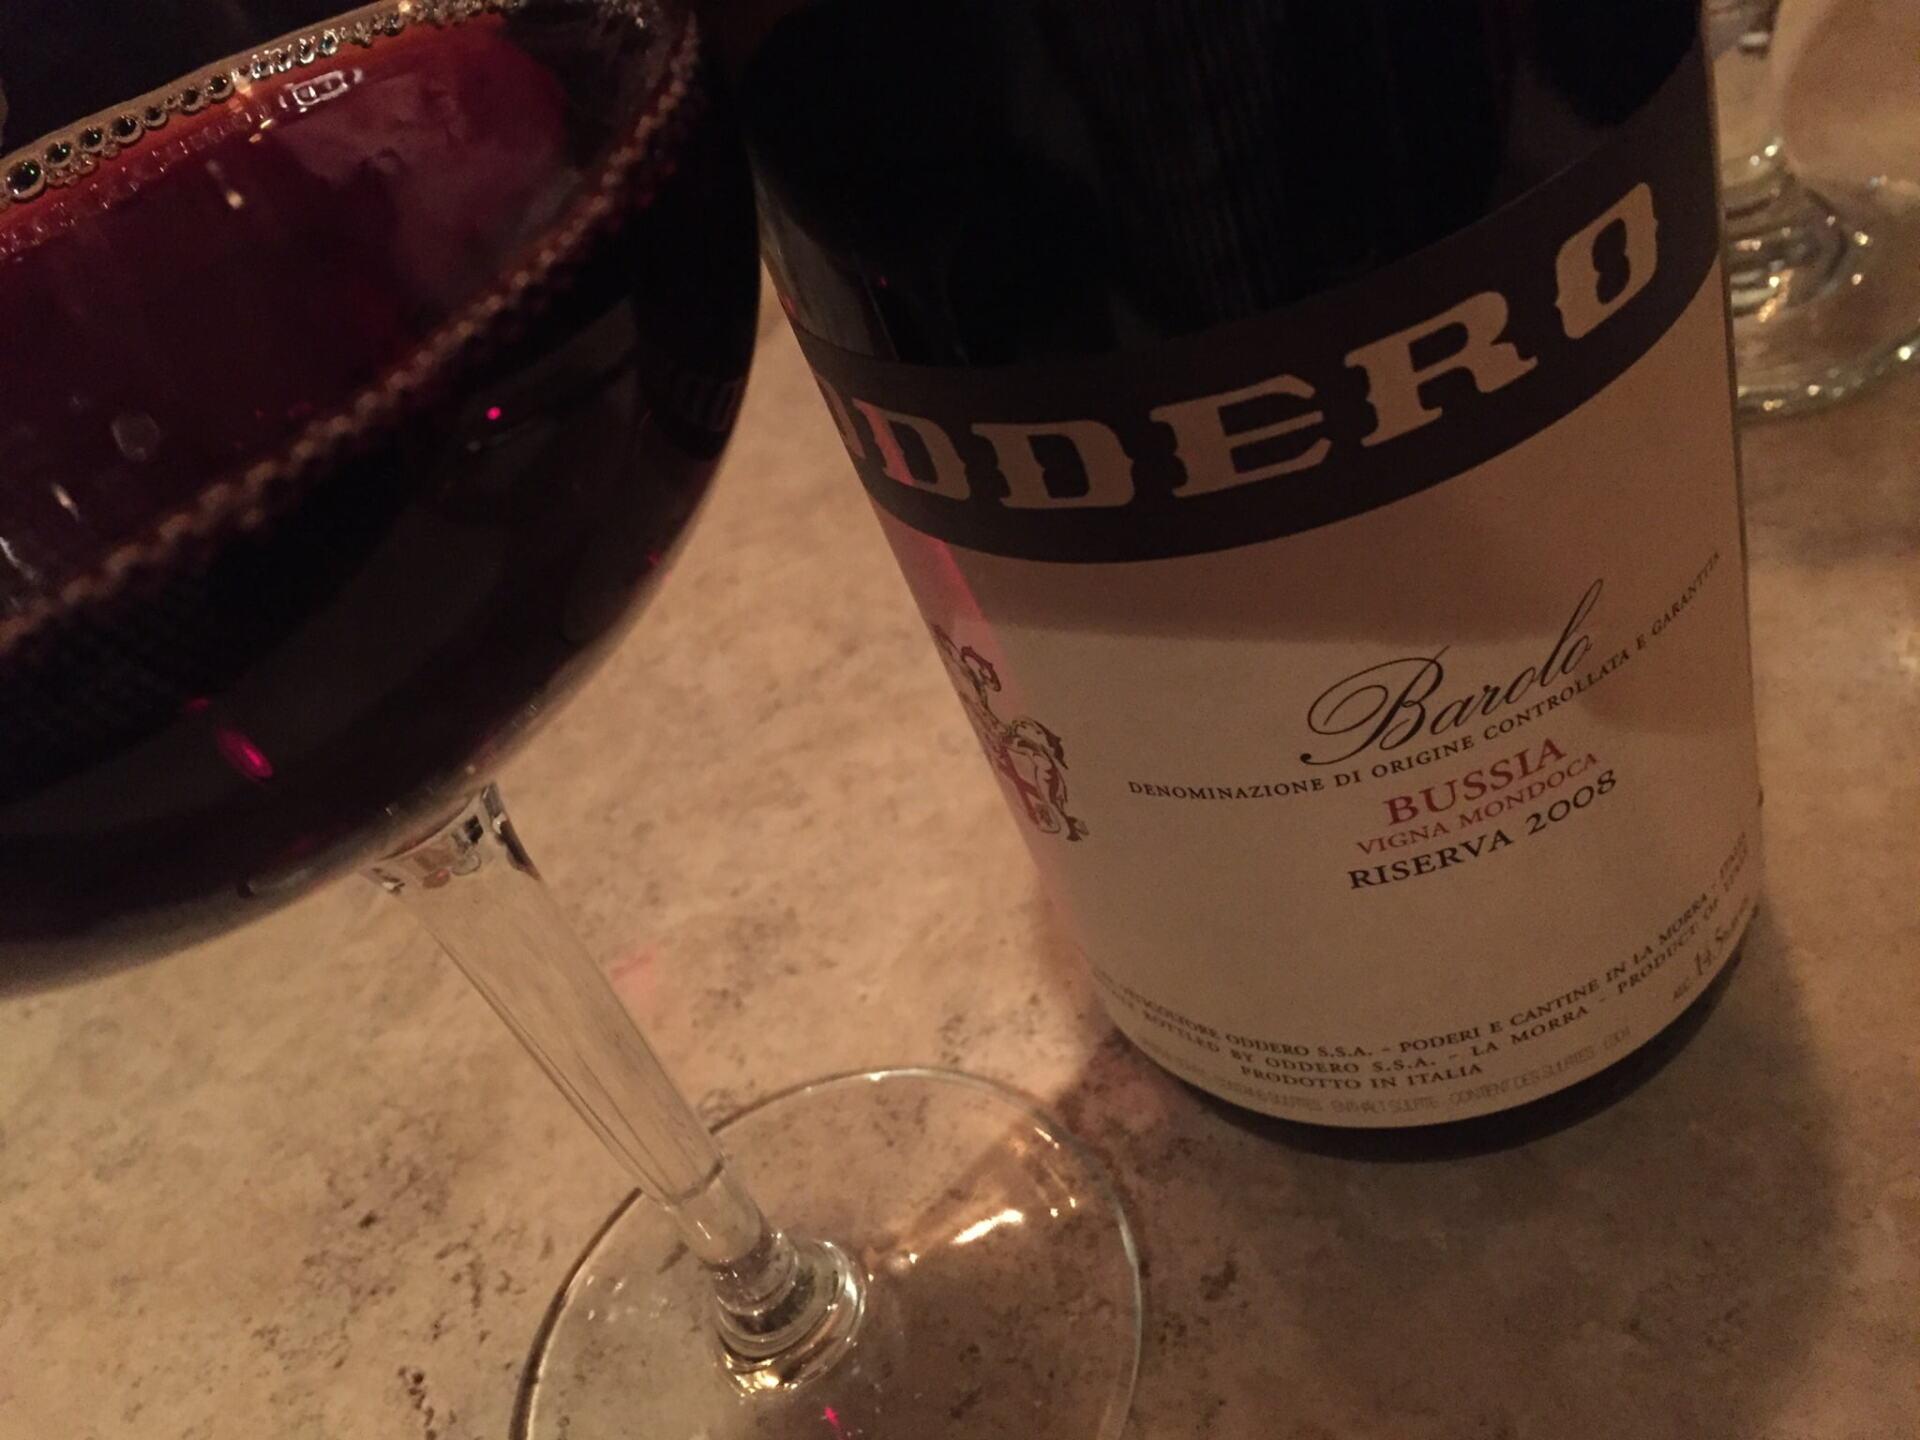 Bottle and glass of Oddero Barolo wine